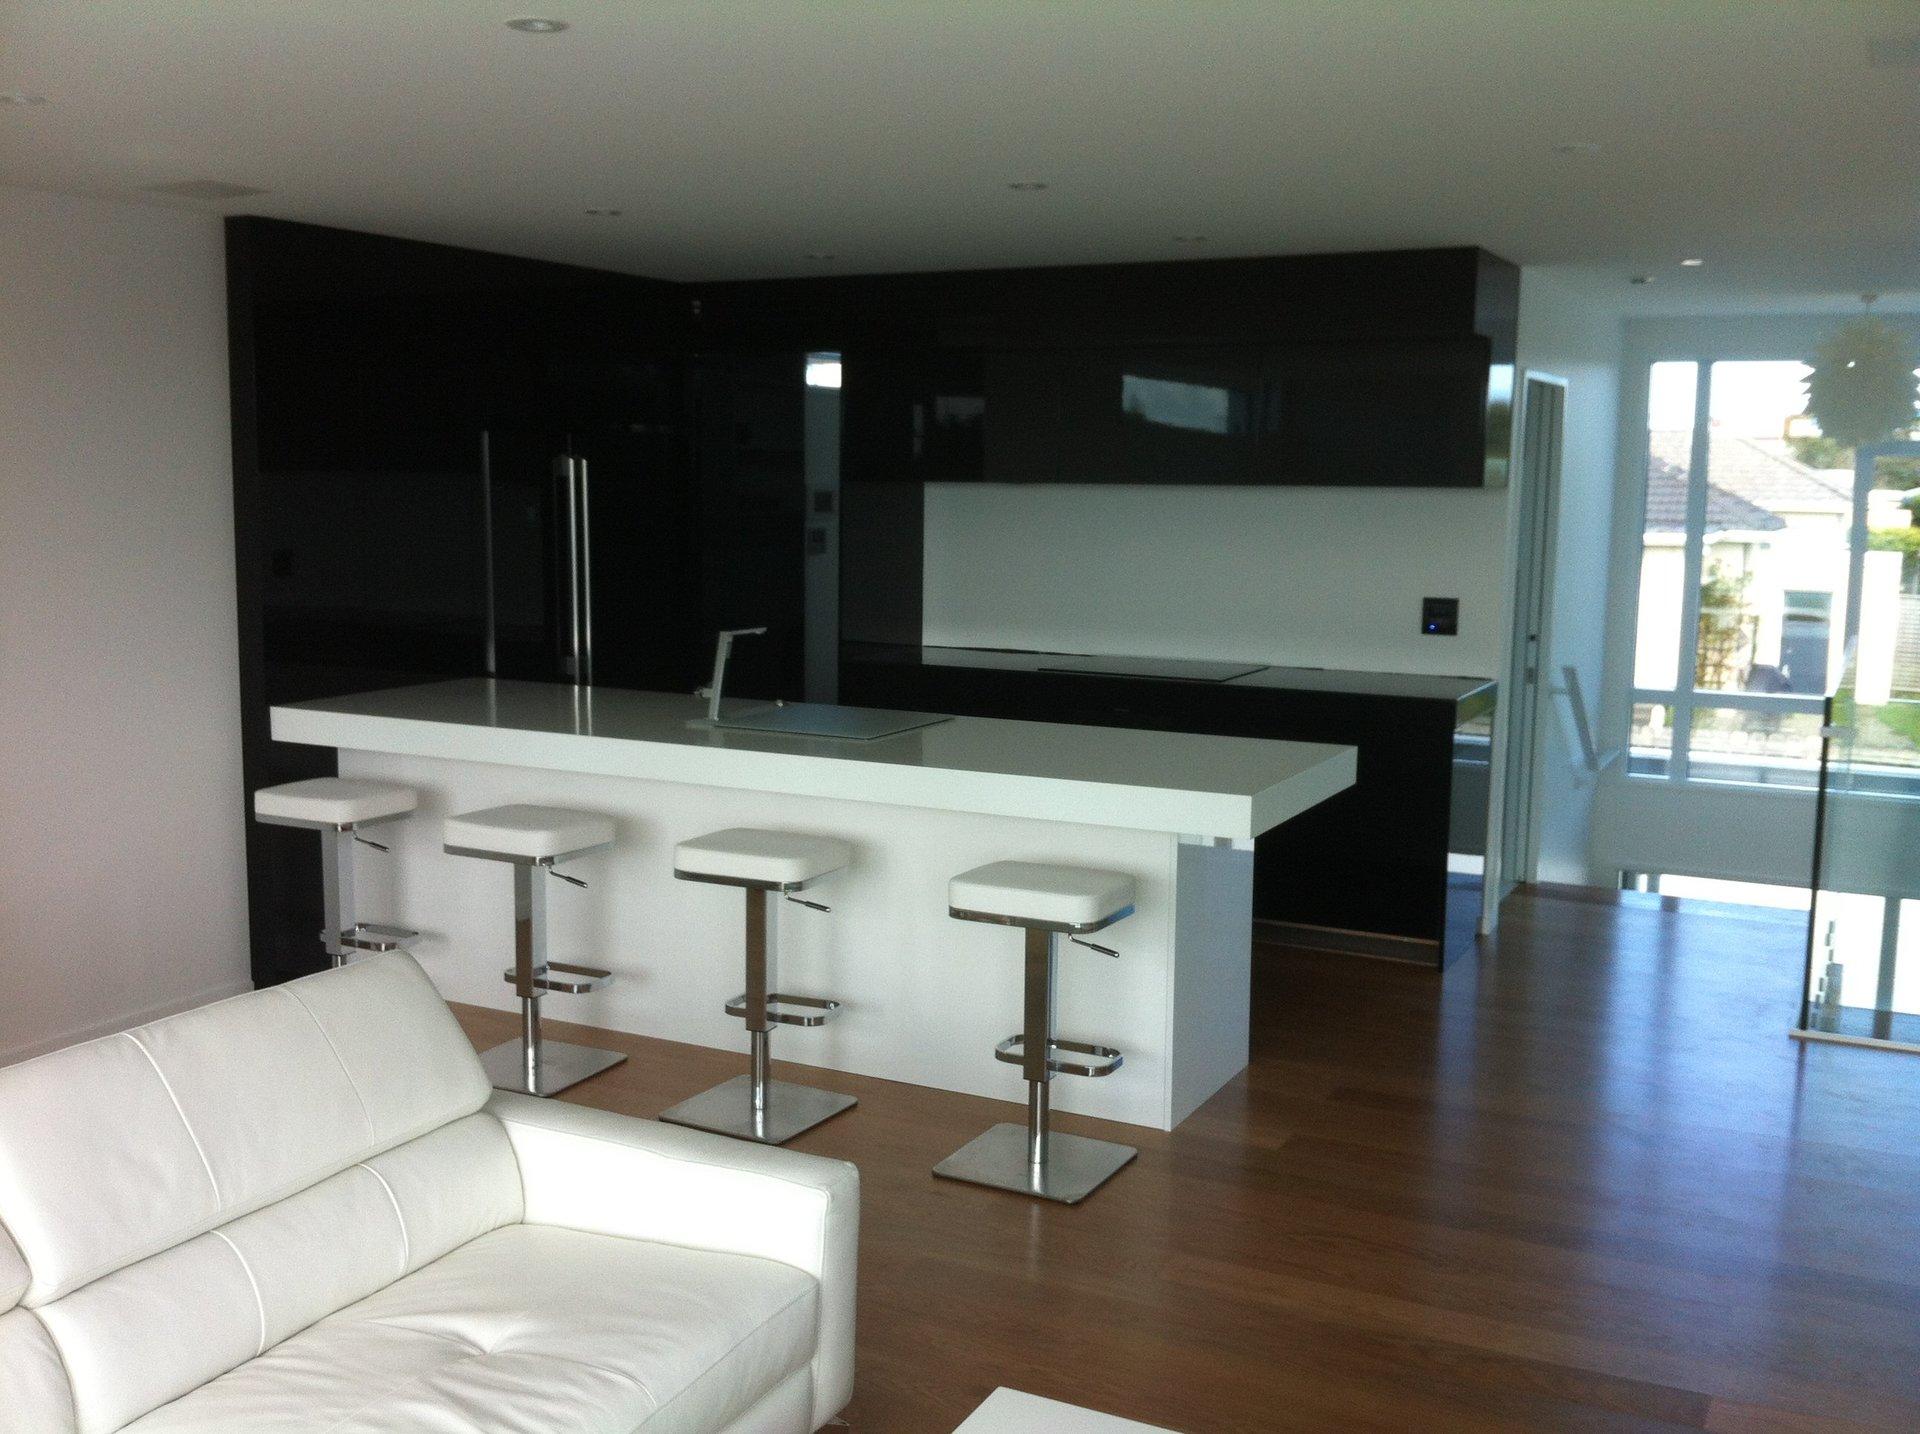 Kitchen Design & Joinery - Future Kitchens Invercargill Central Otago